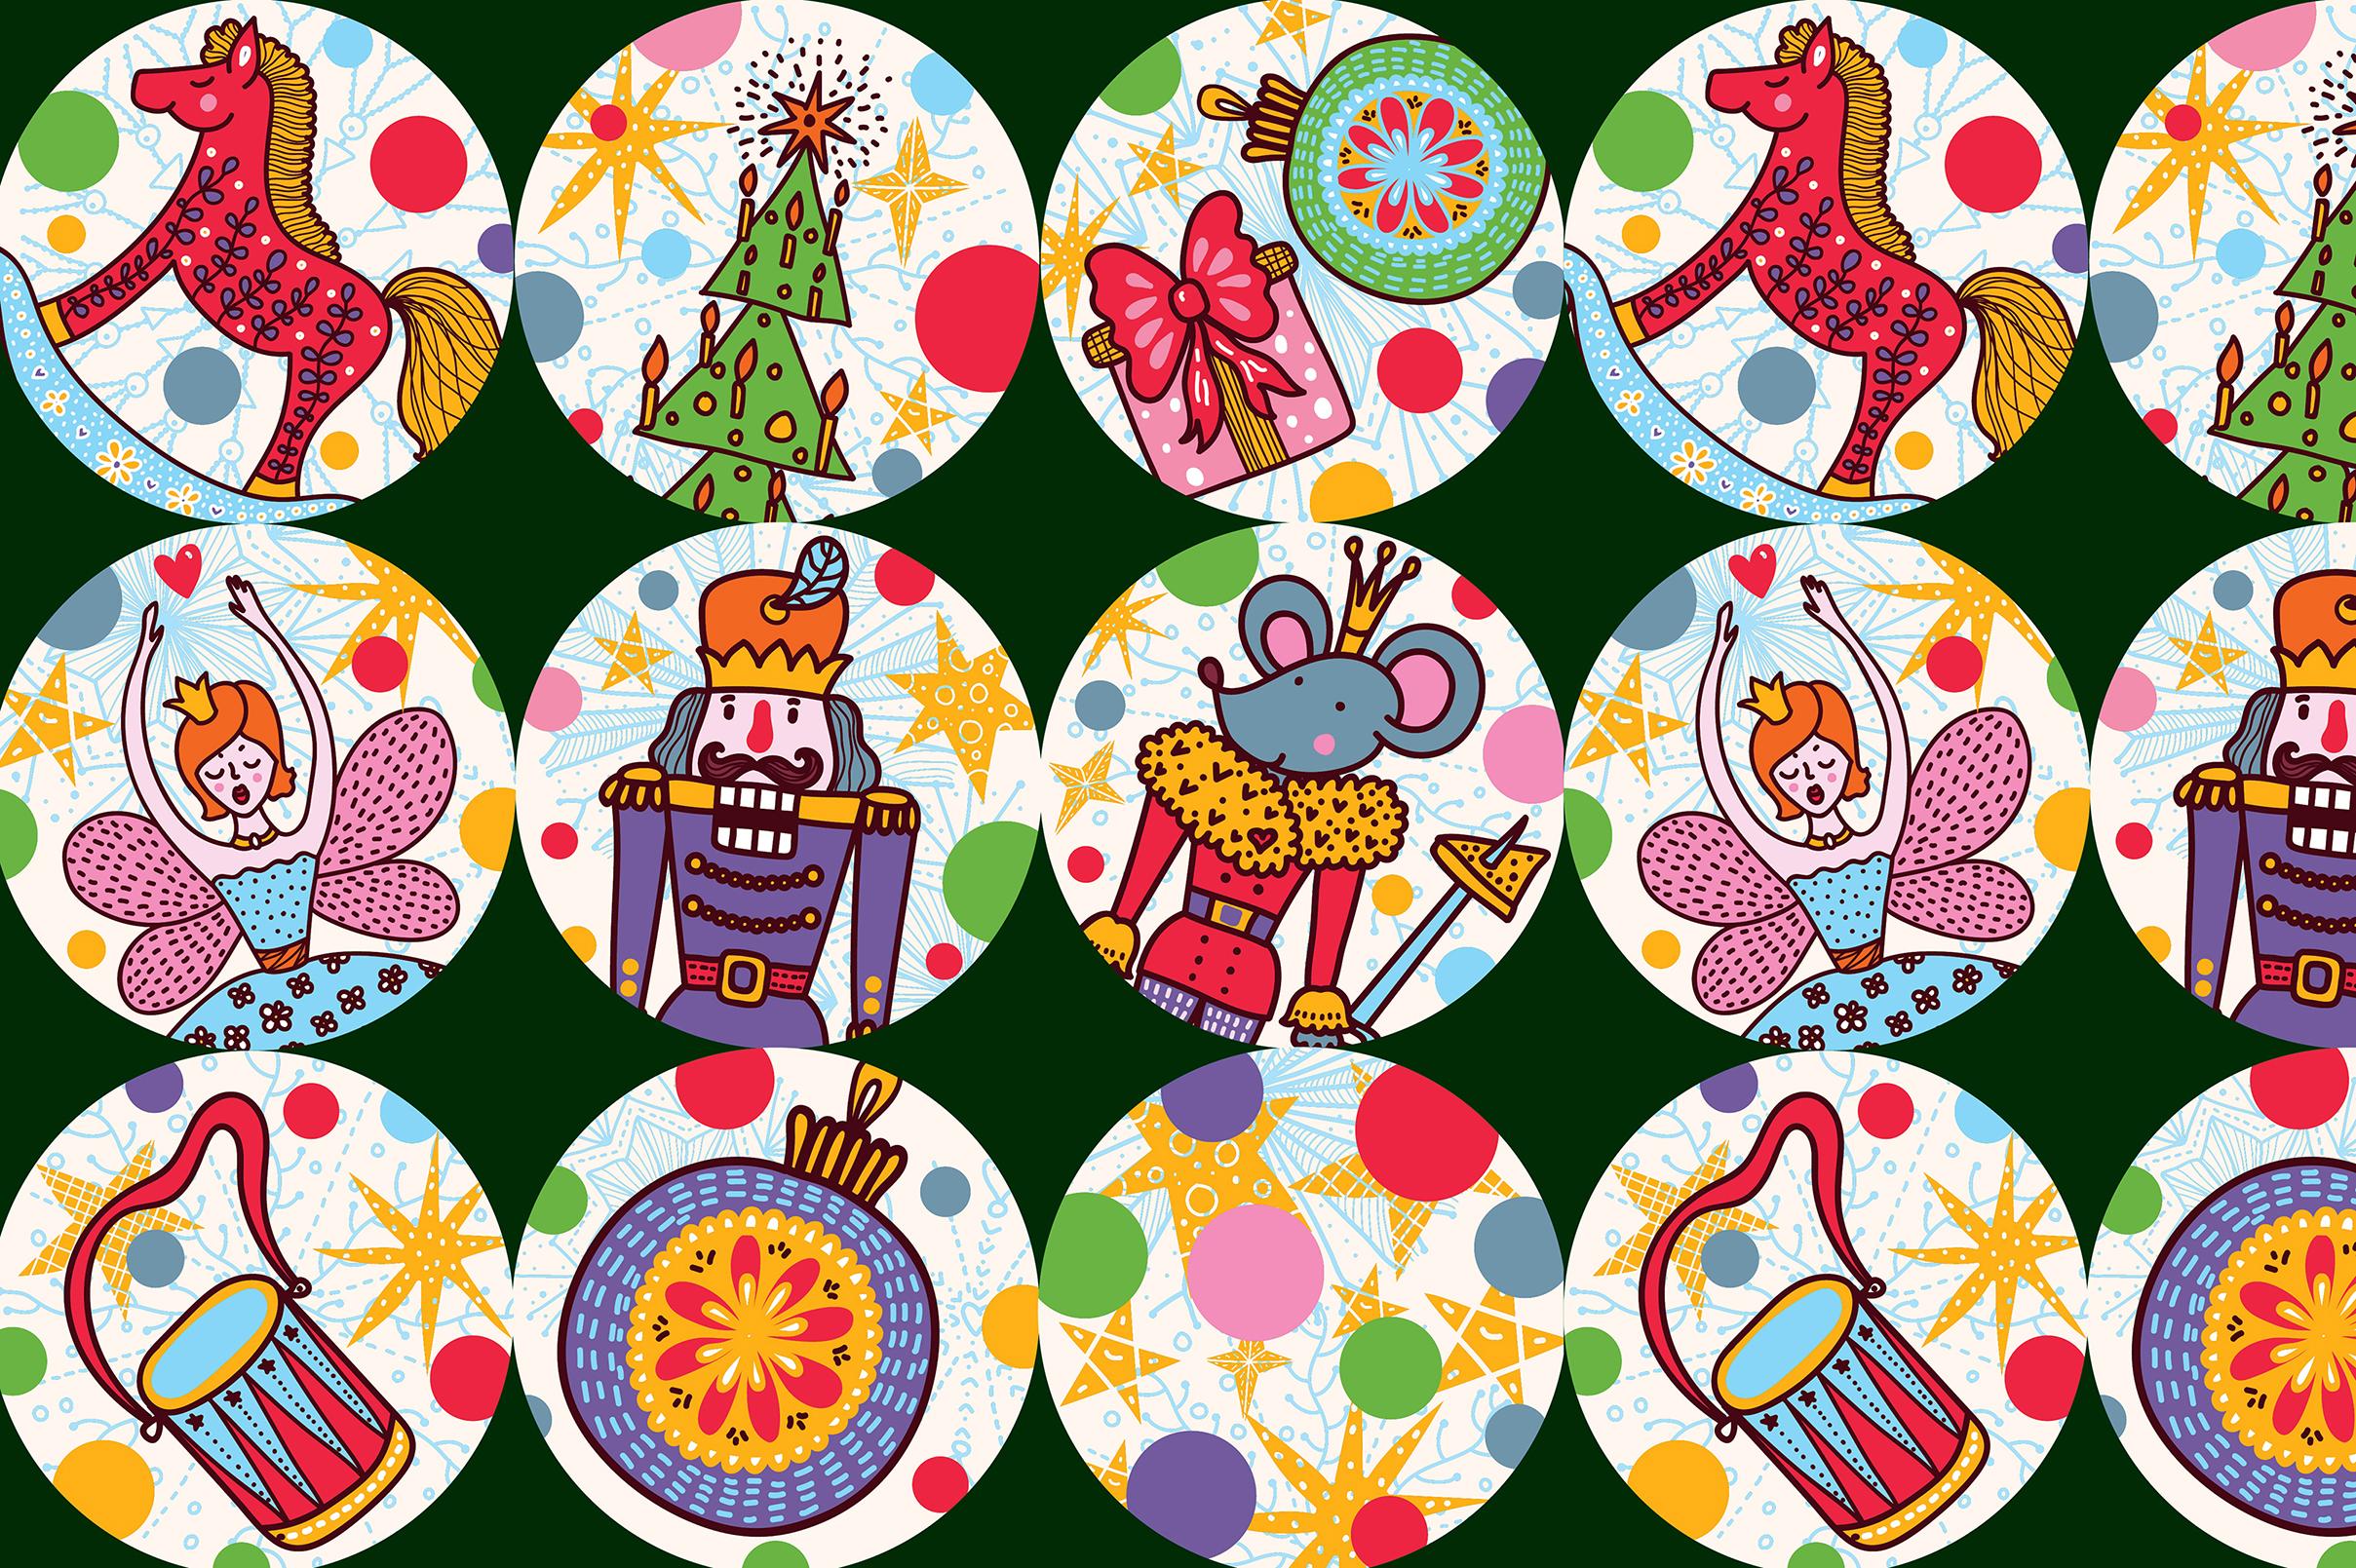 Nutcracker. Christmas story. example image 11